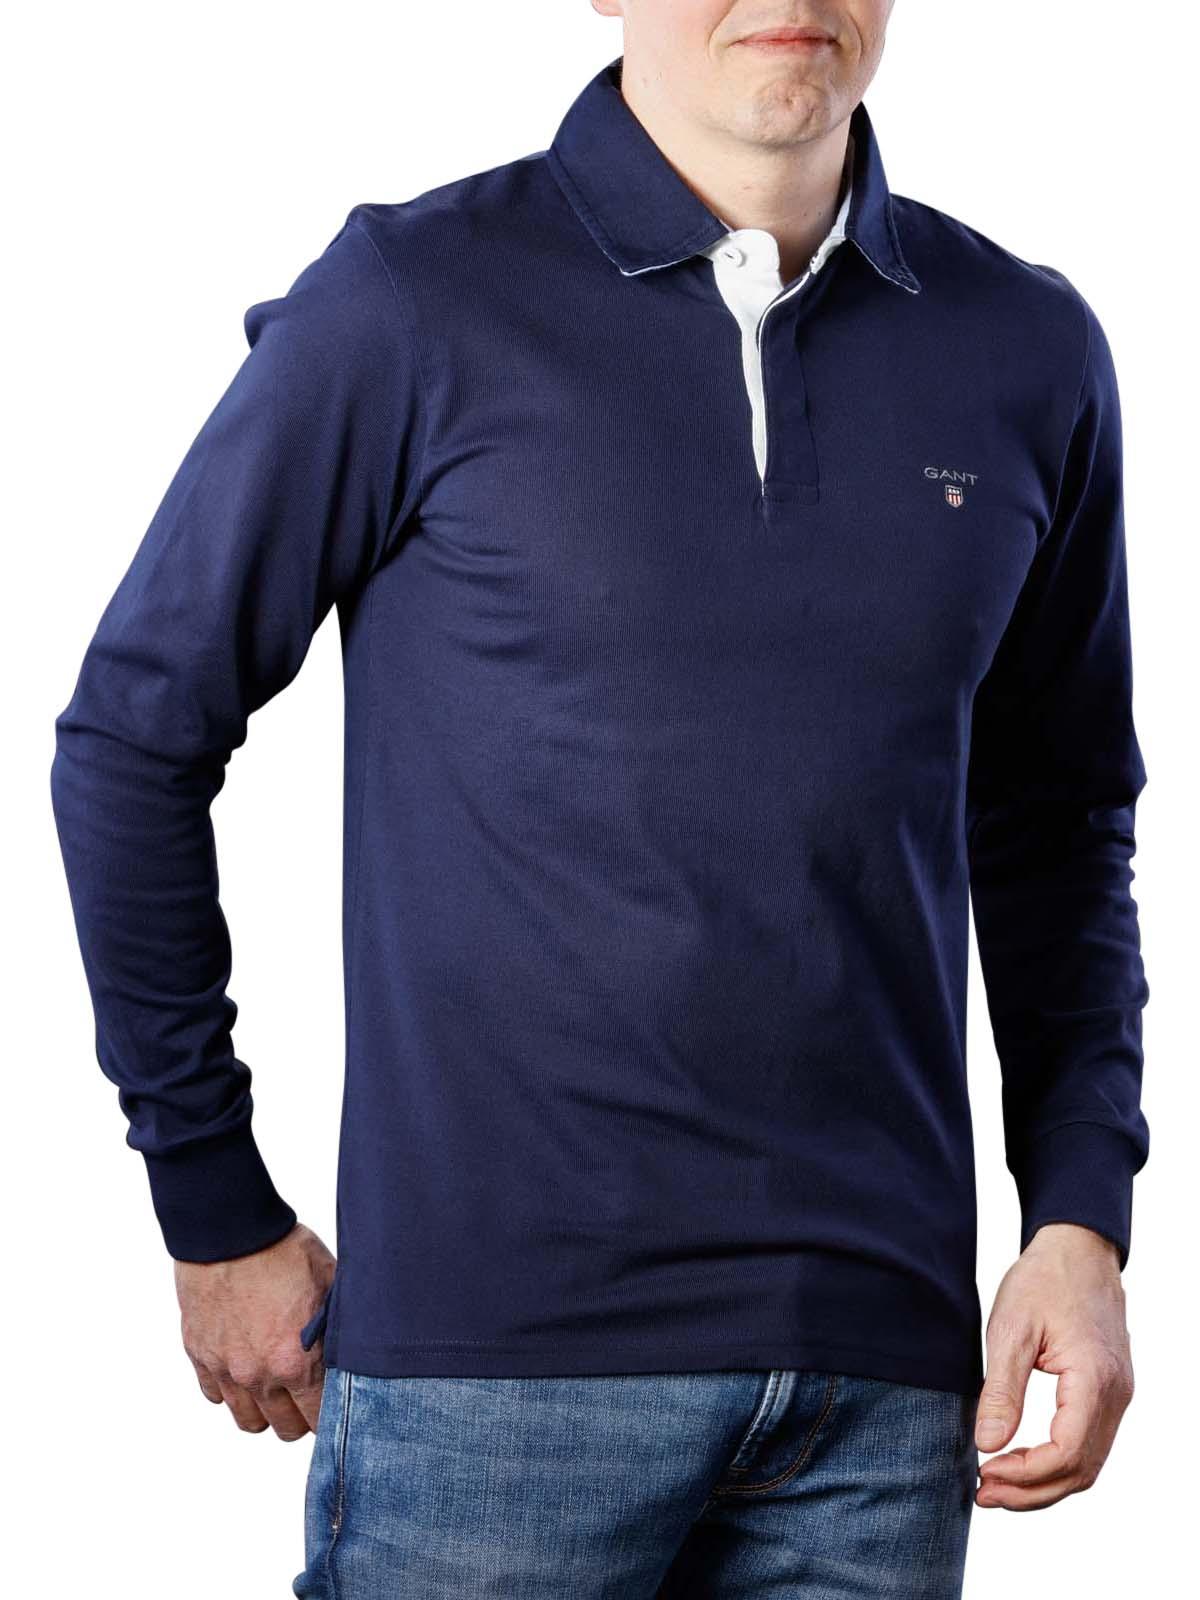 GANT Hommes Sweatshirt The Original Heavy Rugger Navy